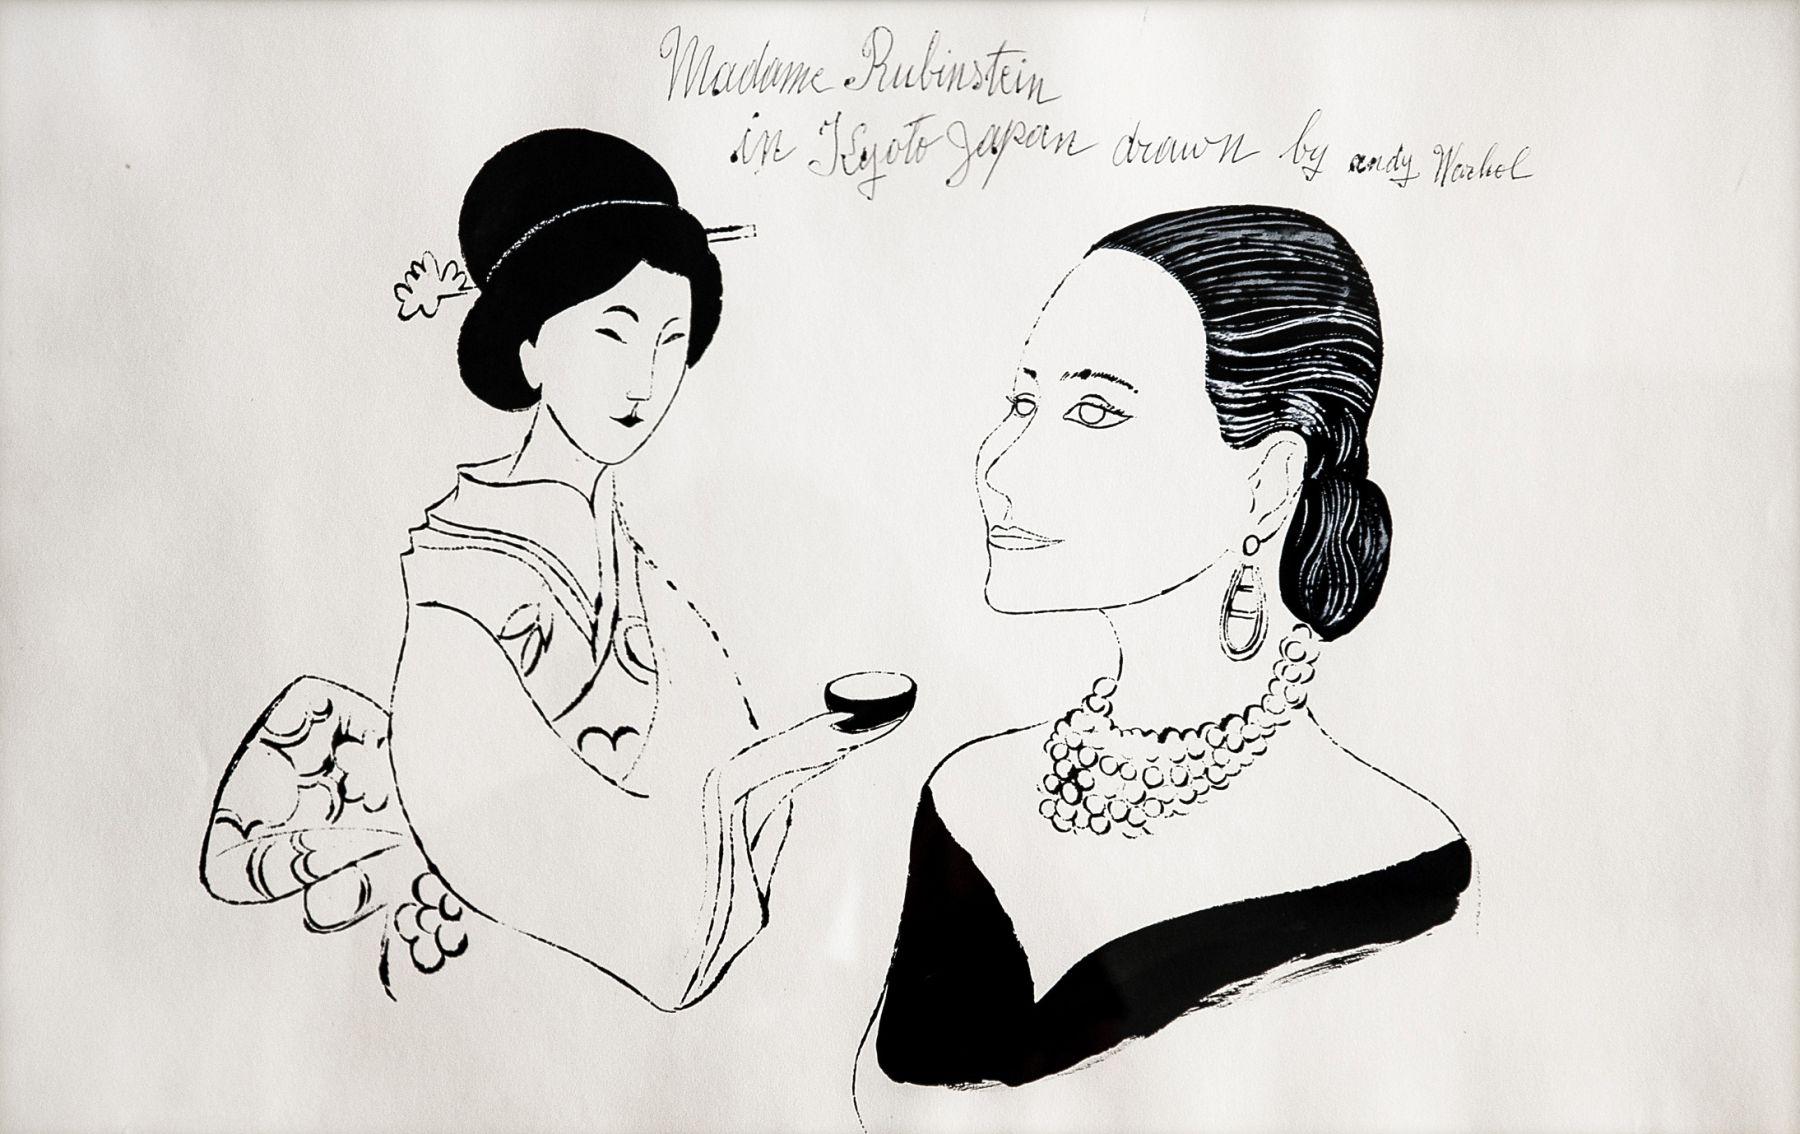 "Andy Warhol_Madame Rubinstein in Kyoto, Japan, 1956 (13"" x 21.5"") - Casterline|Goodman"